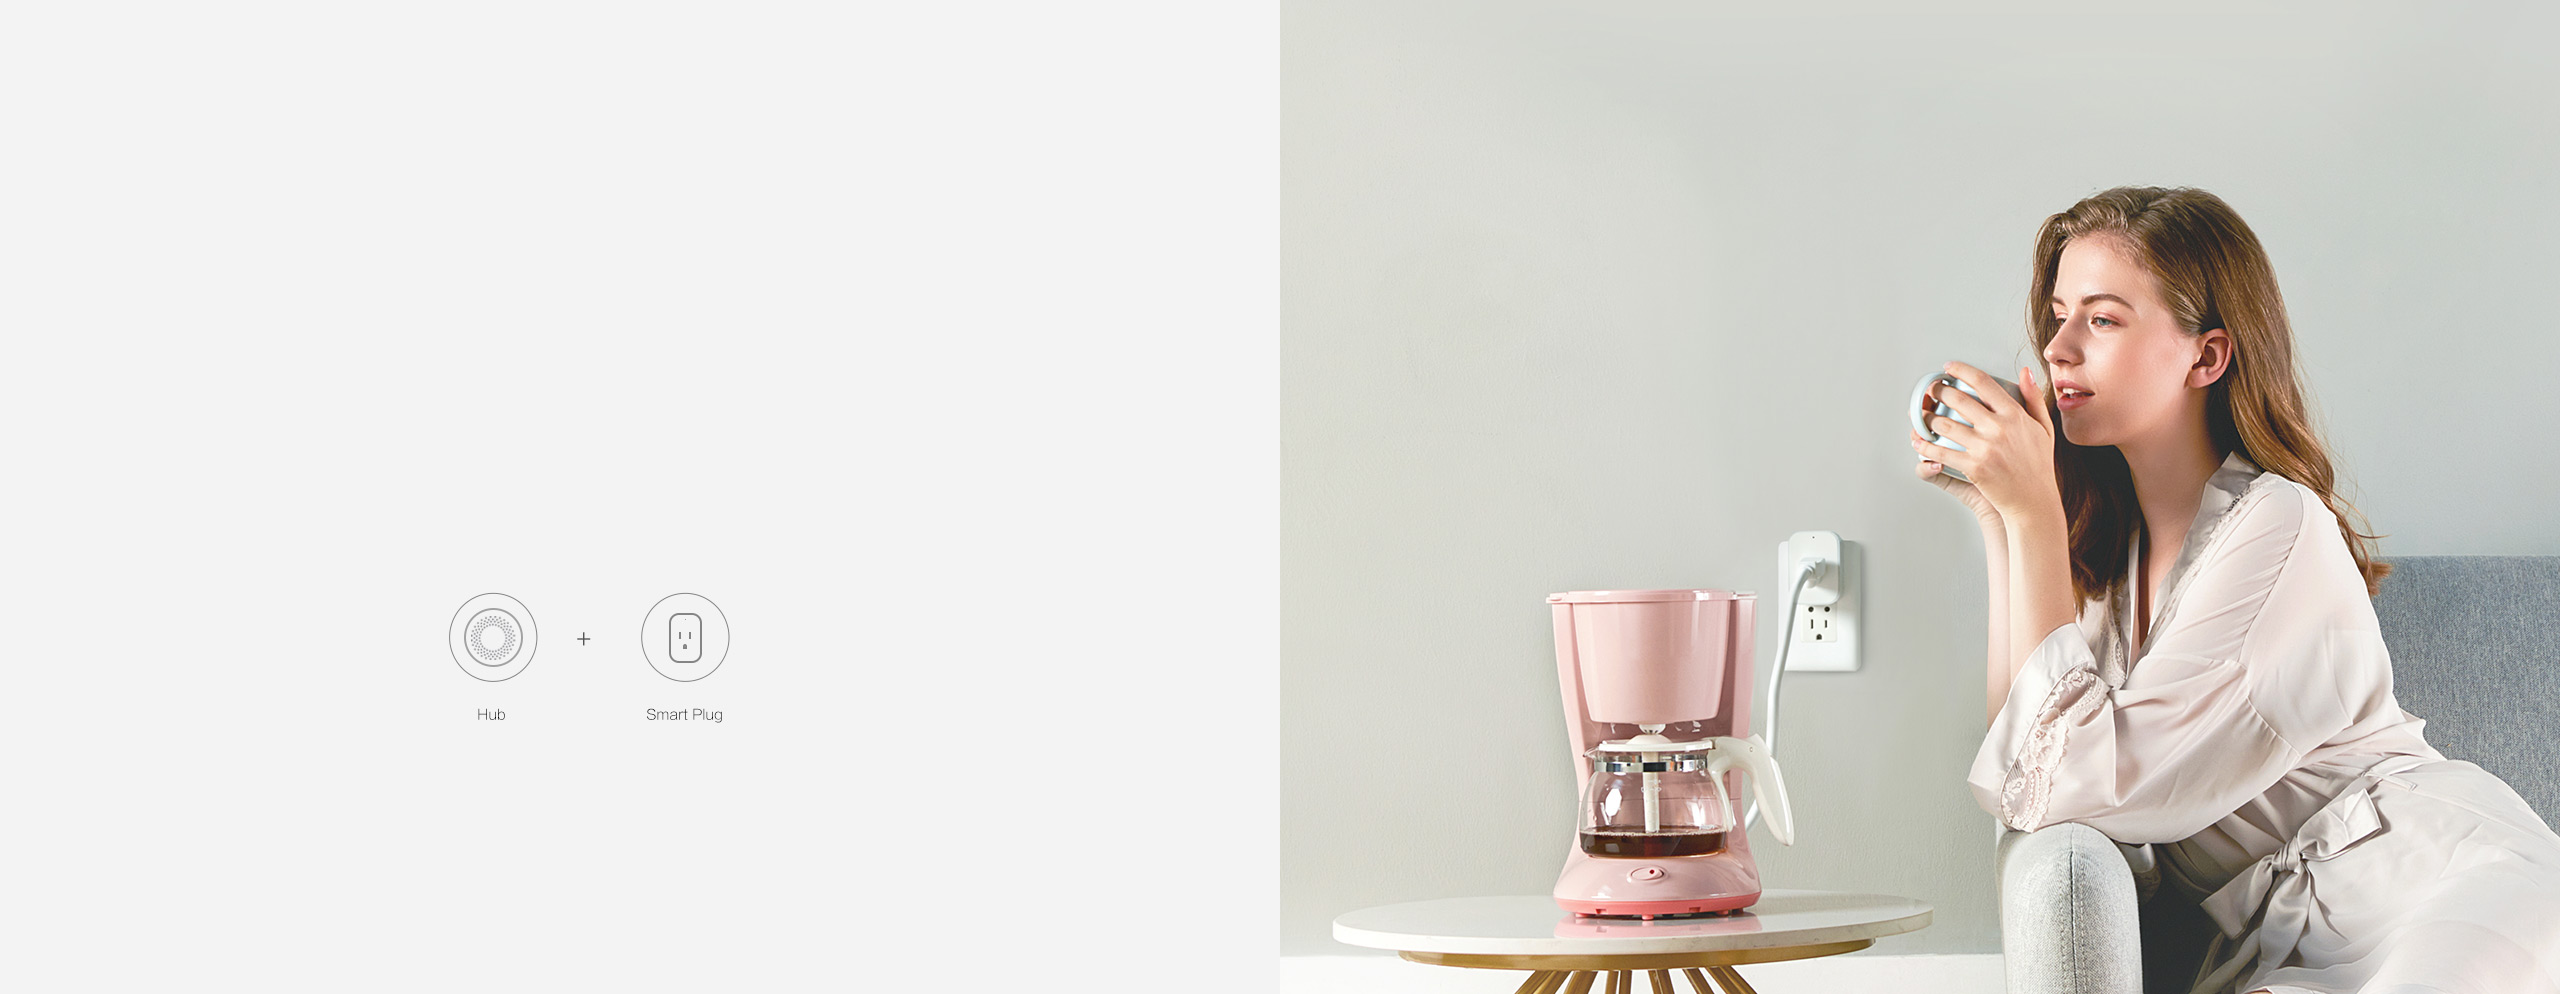 Automate your coffee maker with Aqara us hub and Aqara smart plug.